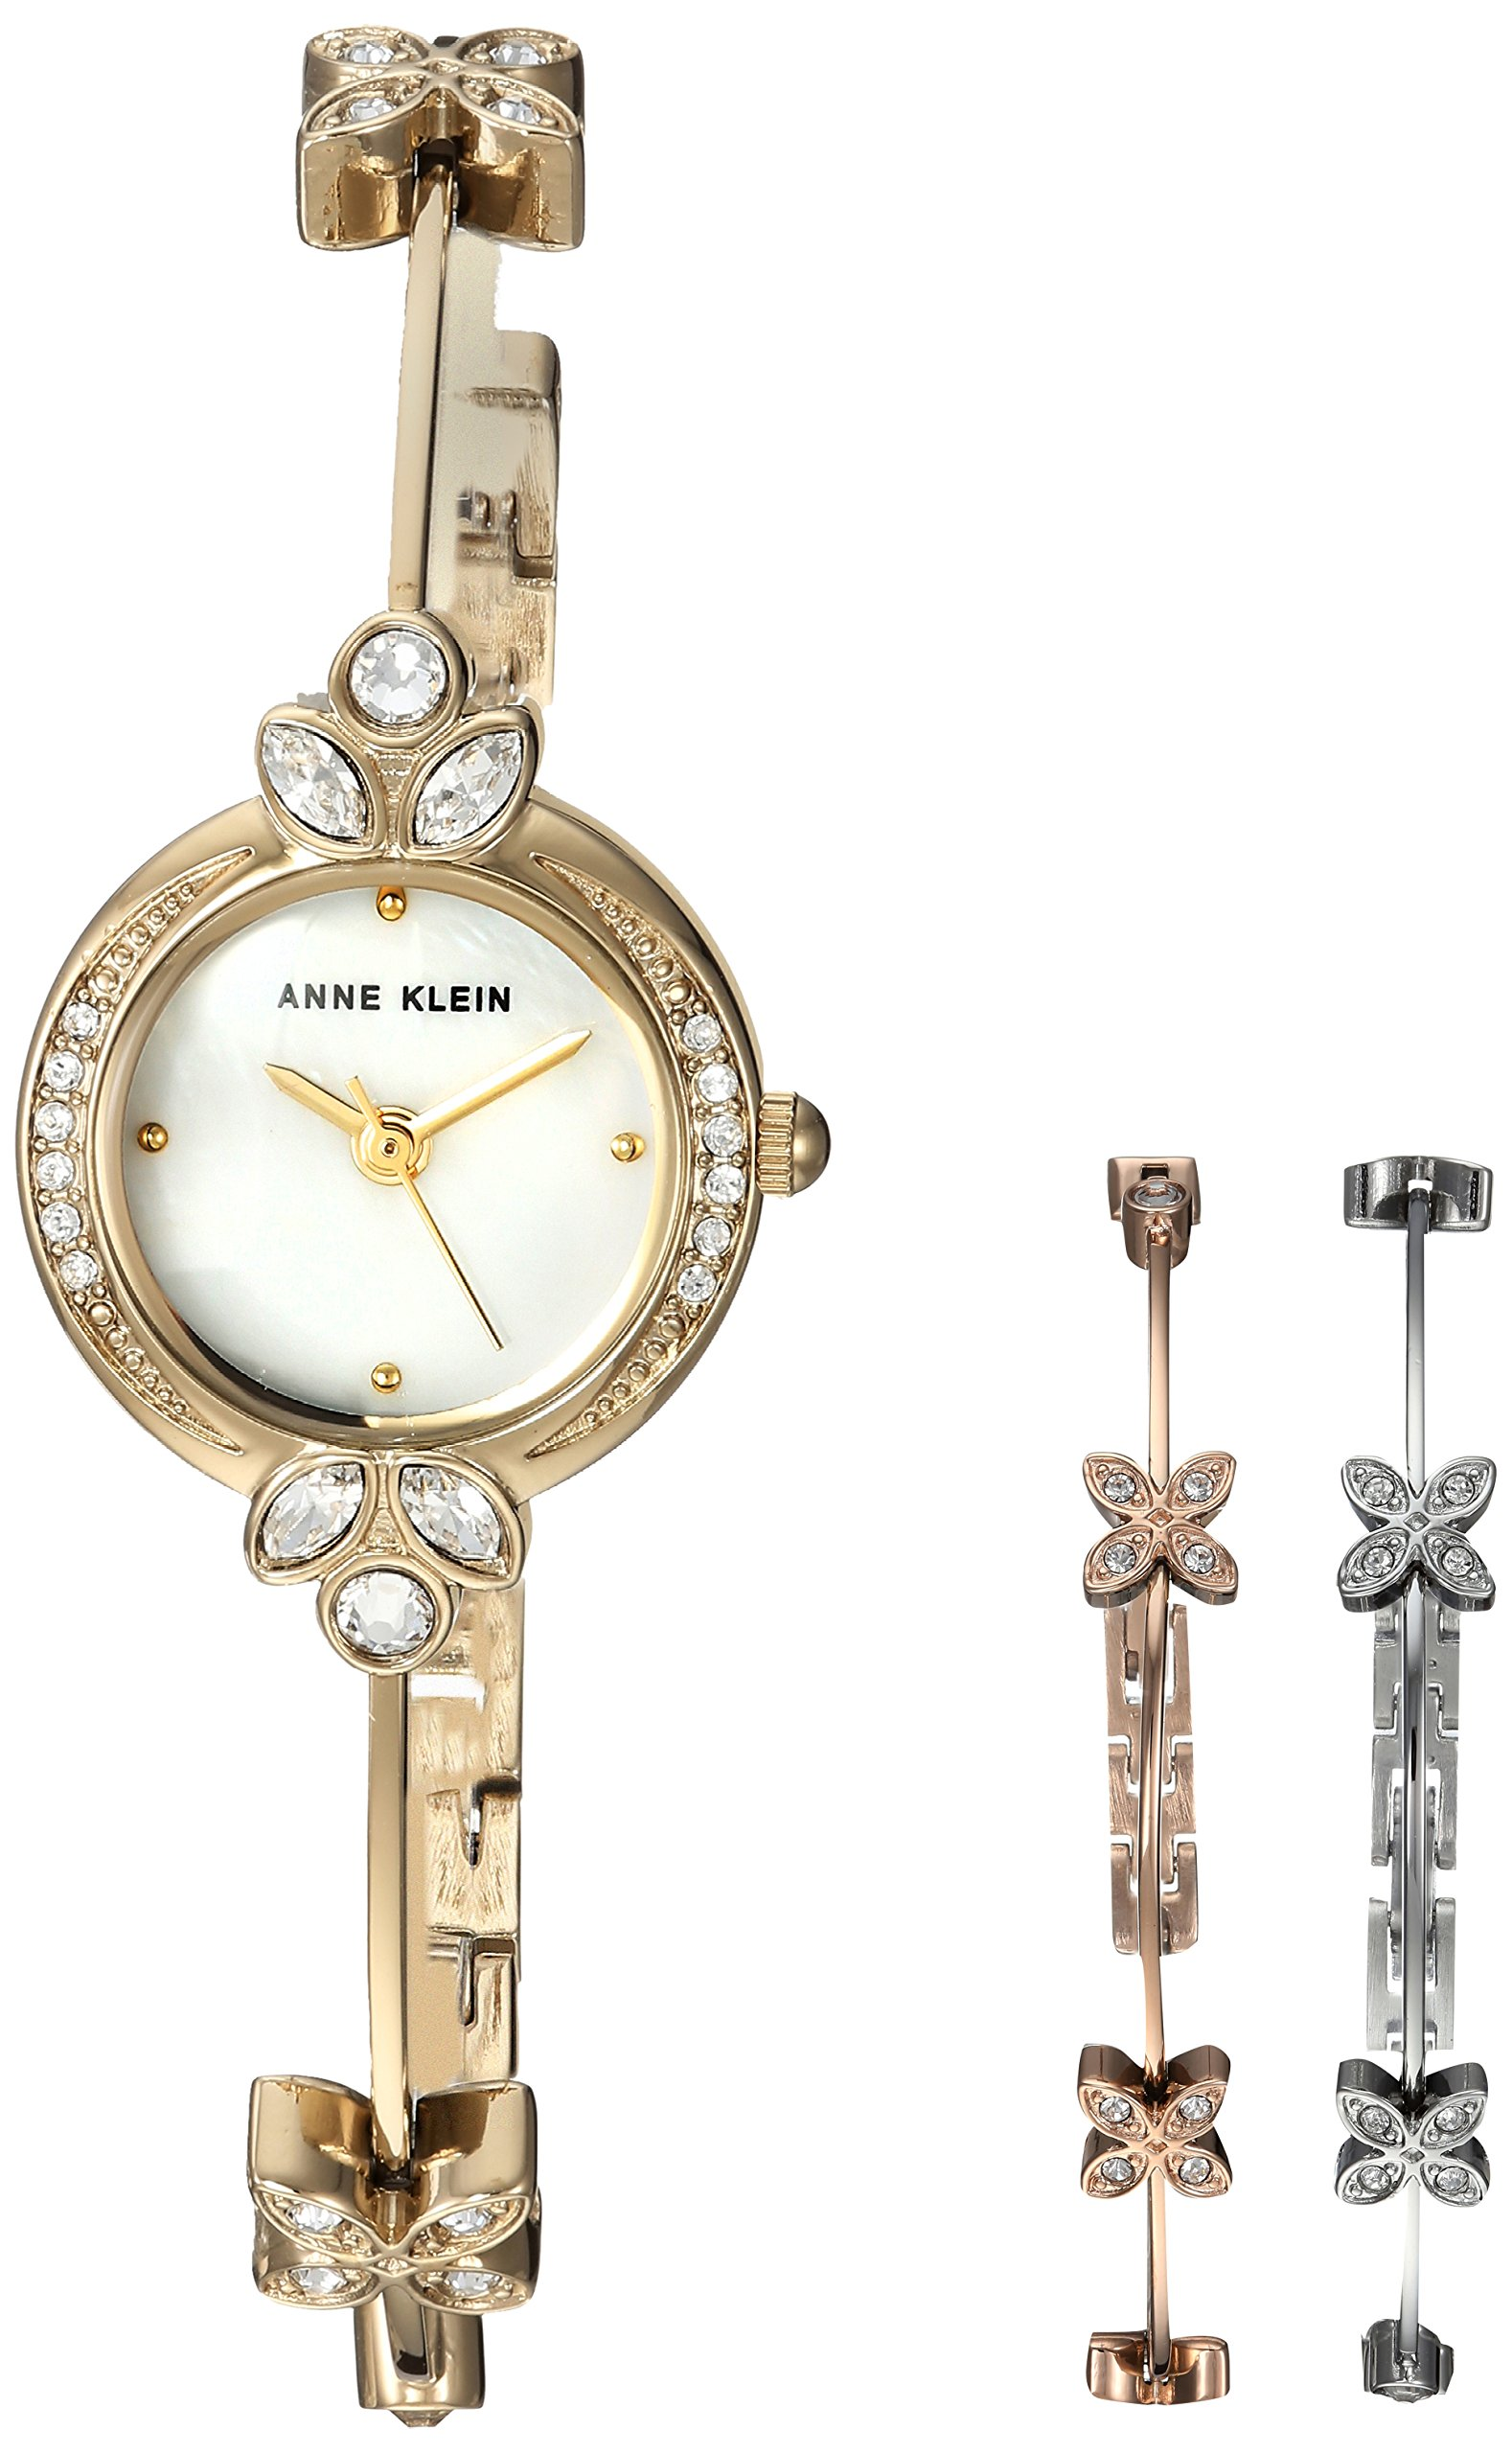 Anne Klein Women's AK/3042TRST Swarovski Crystal Accented Gold-Tone Watch and Bangle Bracelet Set